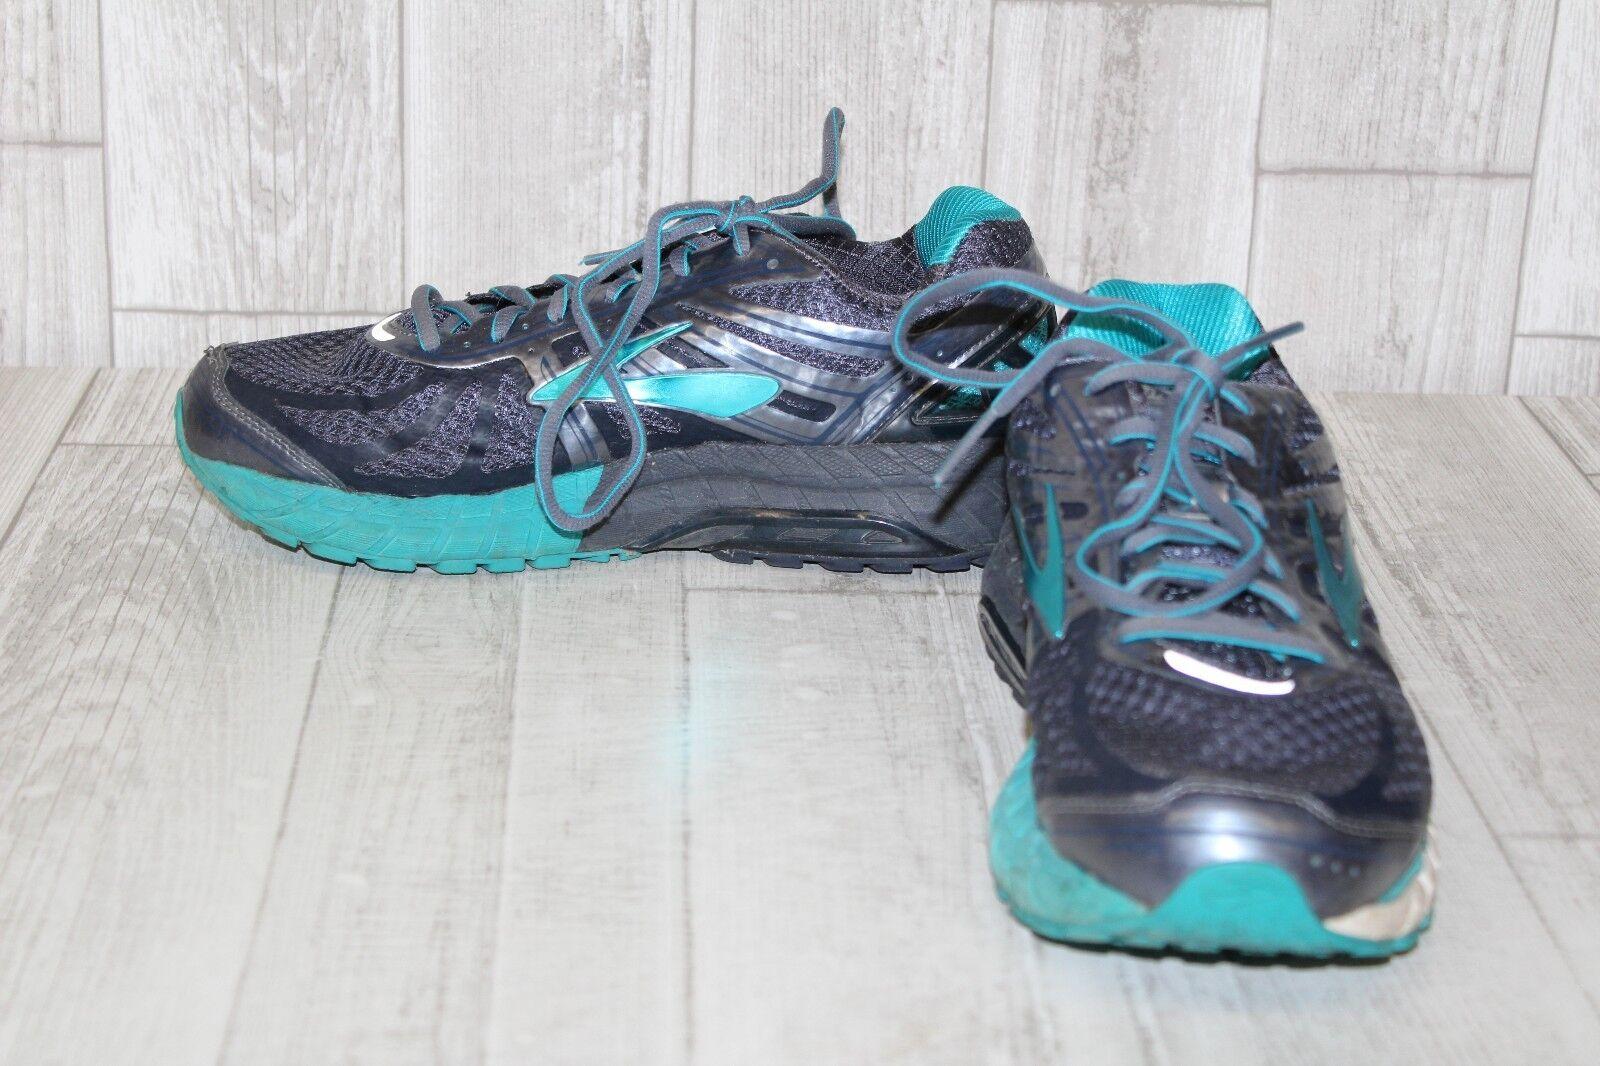 Brooks Ariel 16 Running Shoe - Women's Size 9.5 D, Indigo/Capri Breeze/Grisalle